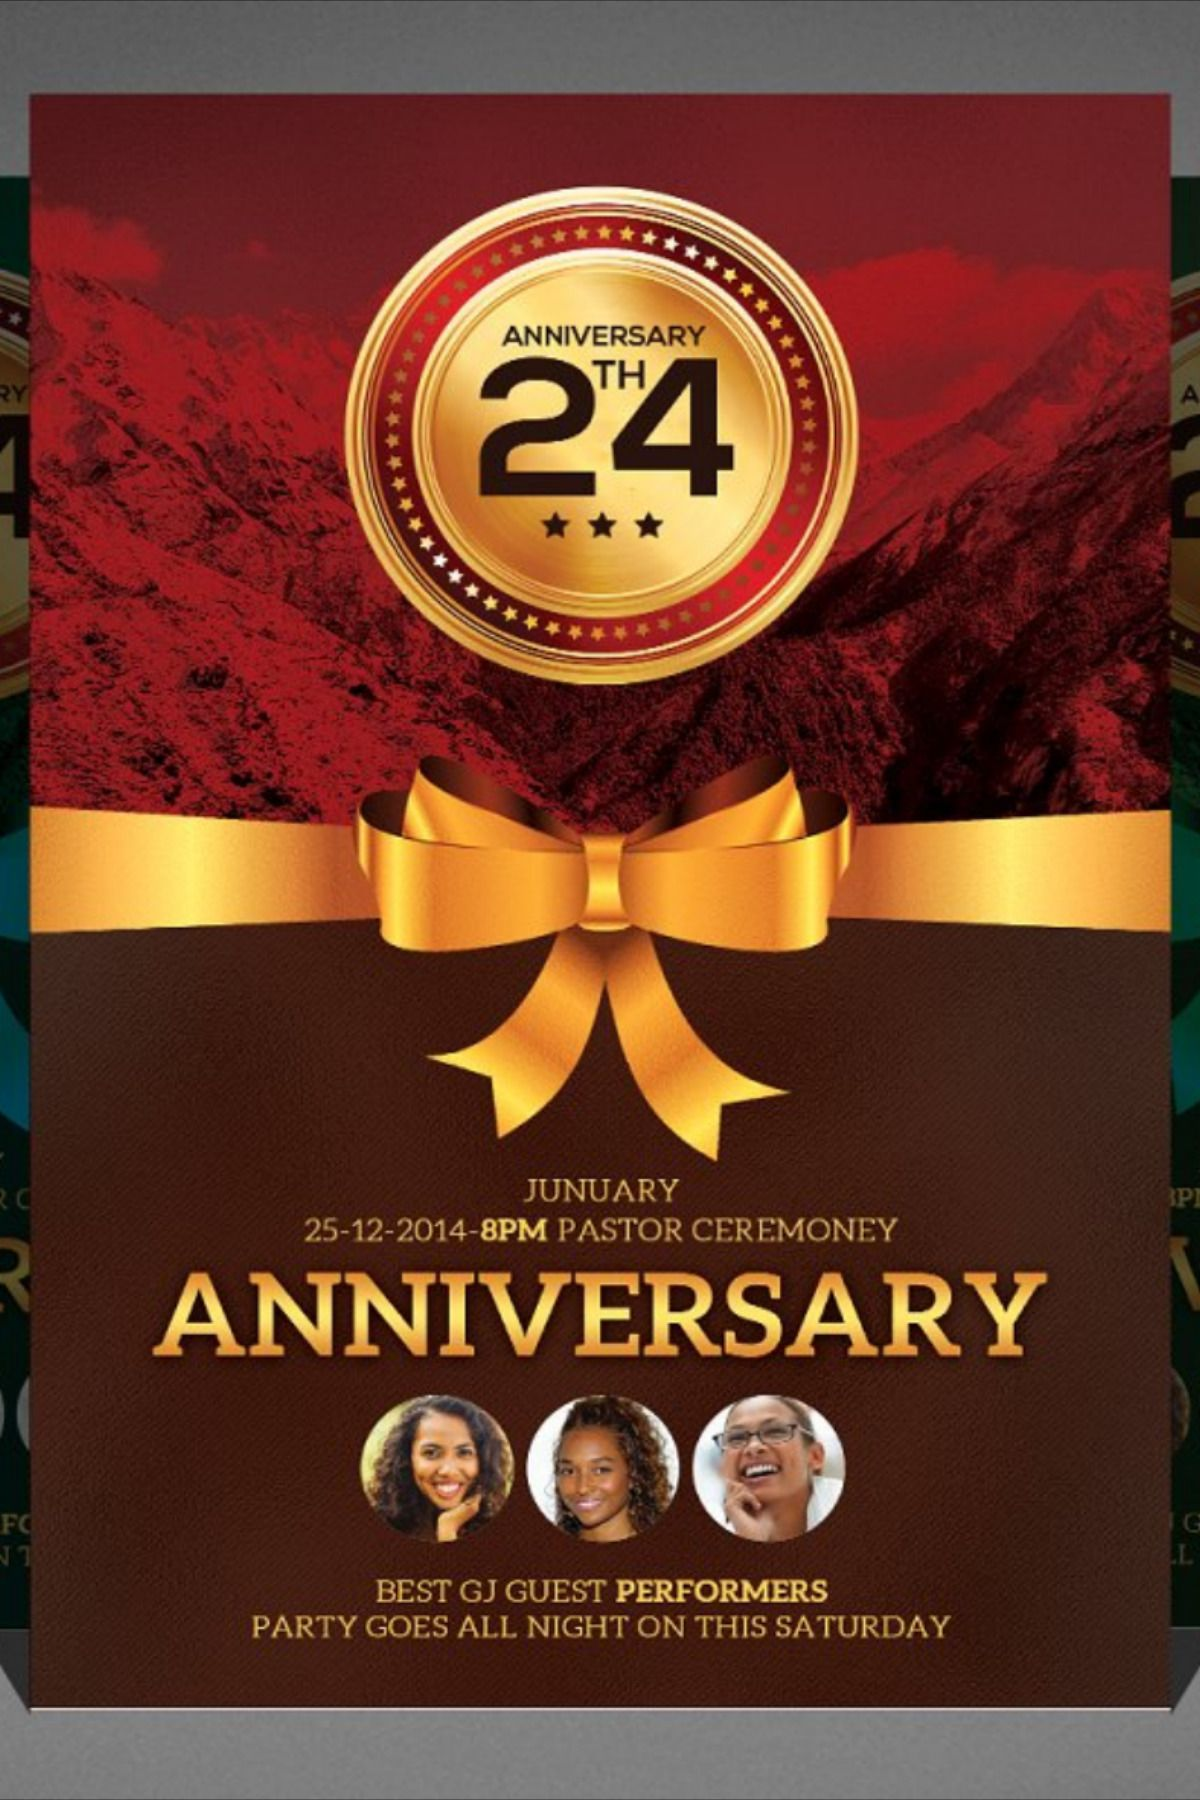 Church Anniversary Flyer Flyer, Psd template free